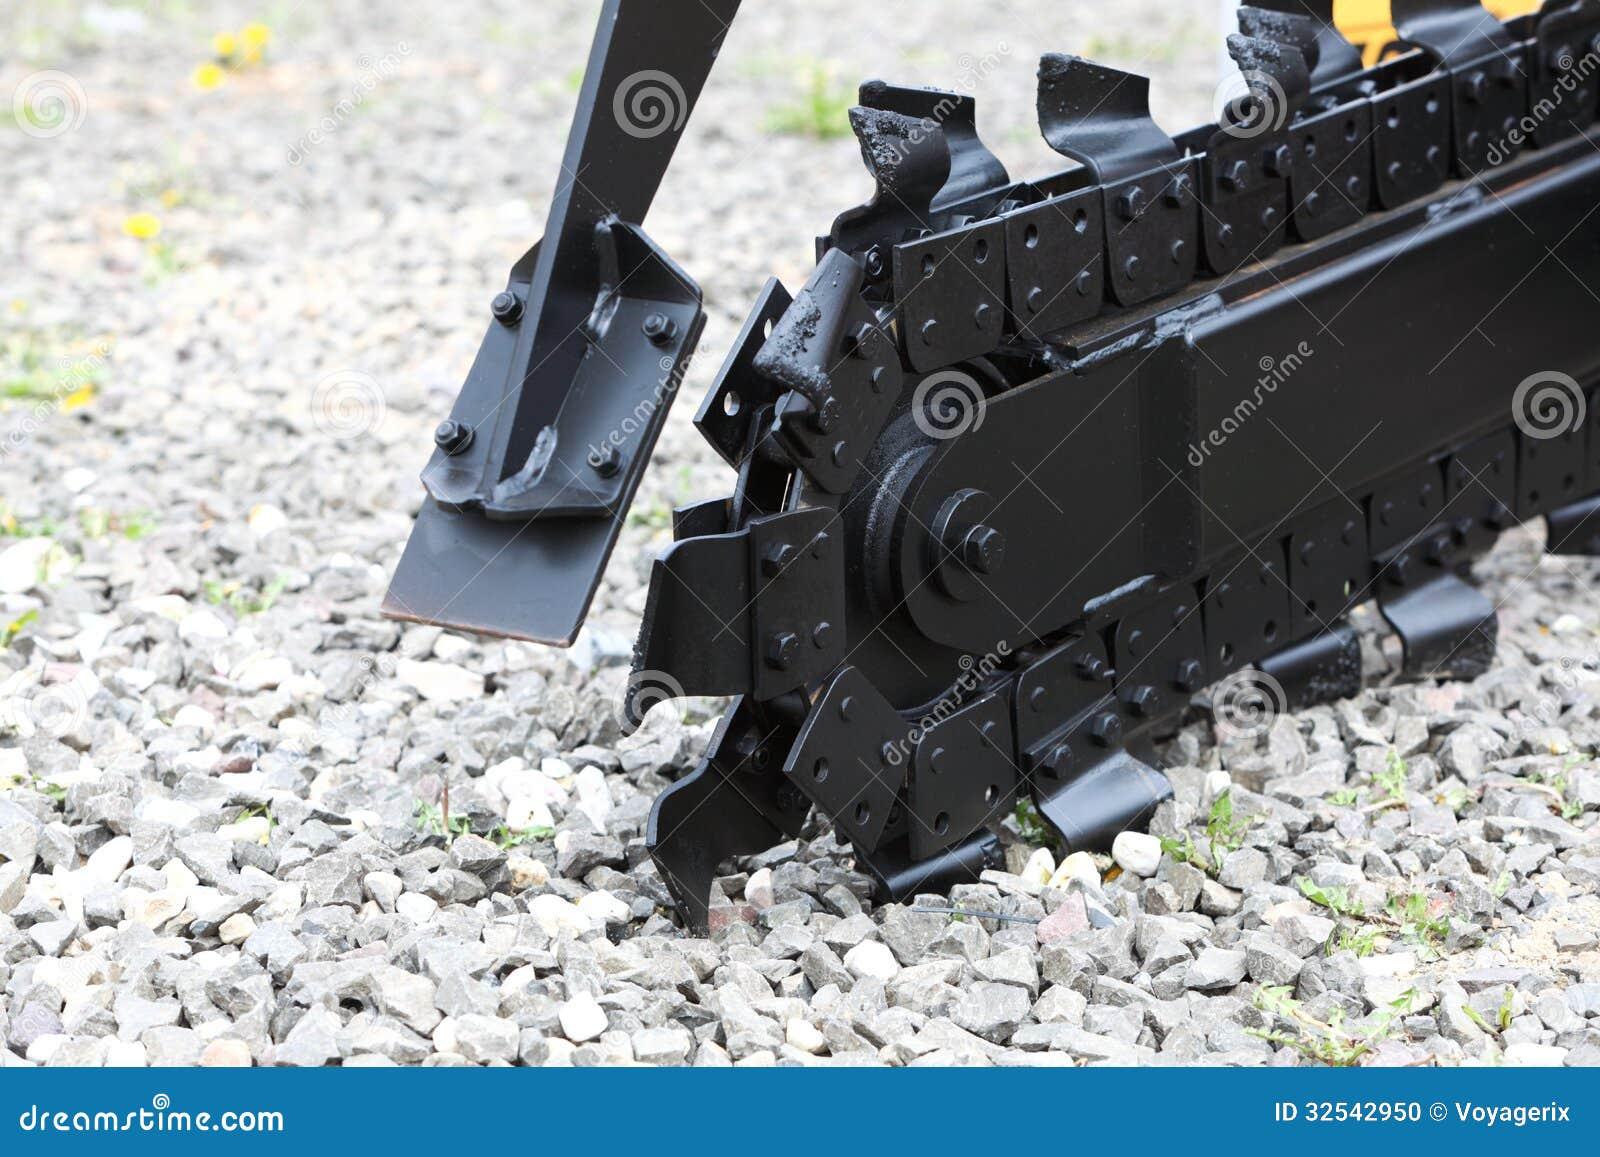 trench digger machine